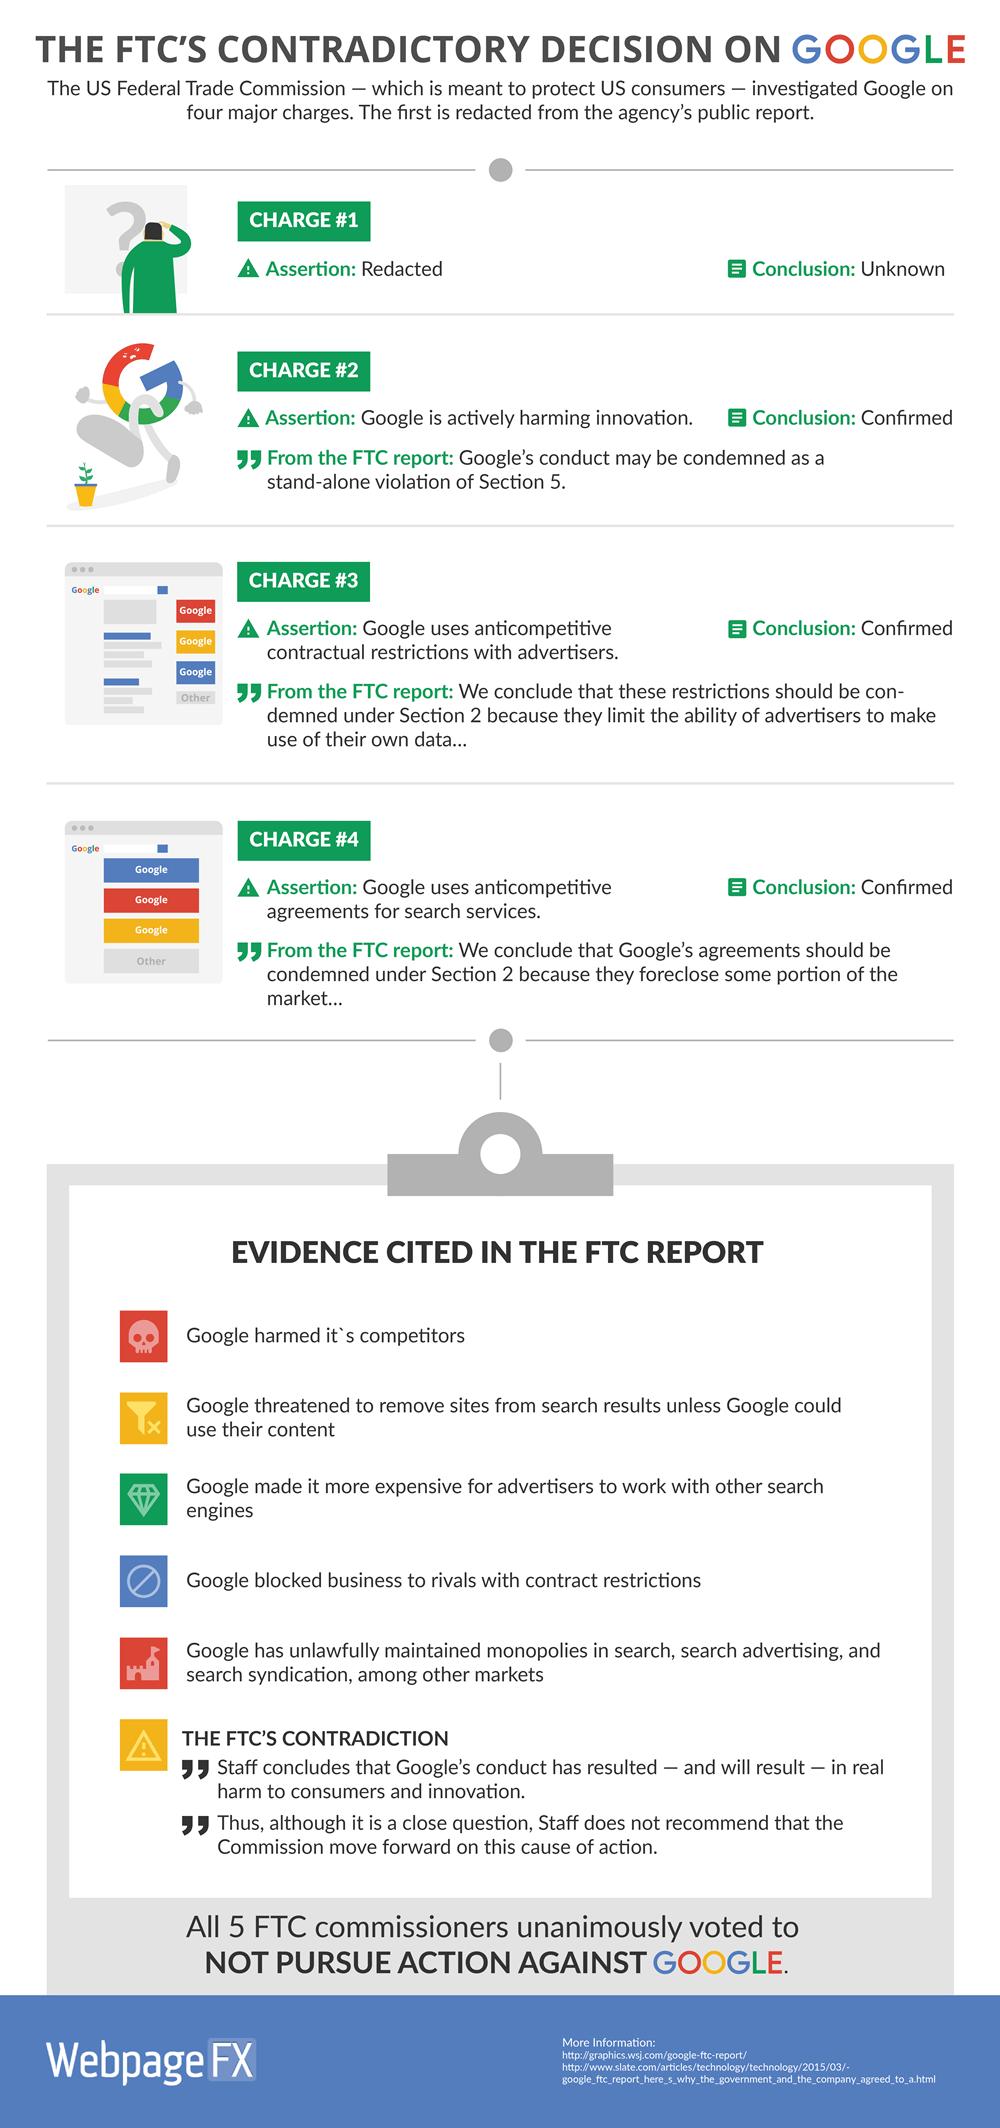 ftc-decision-on-google